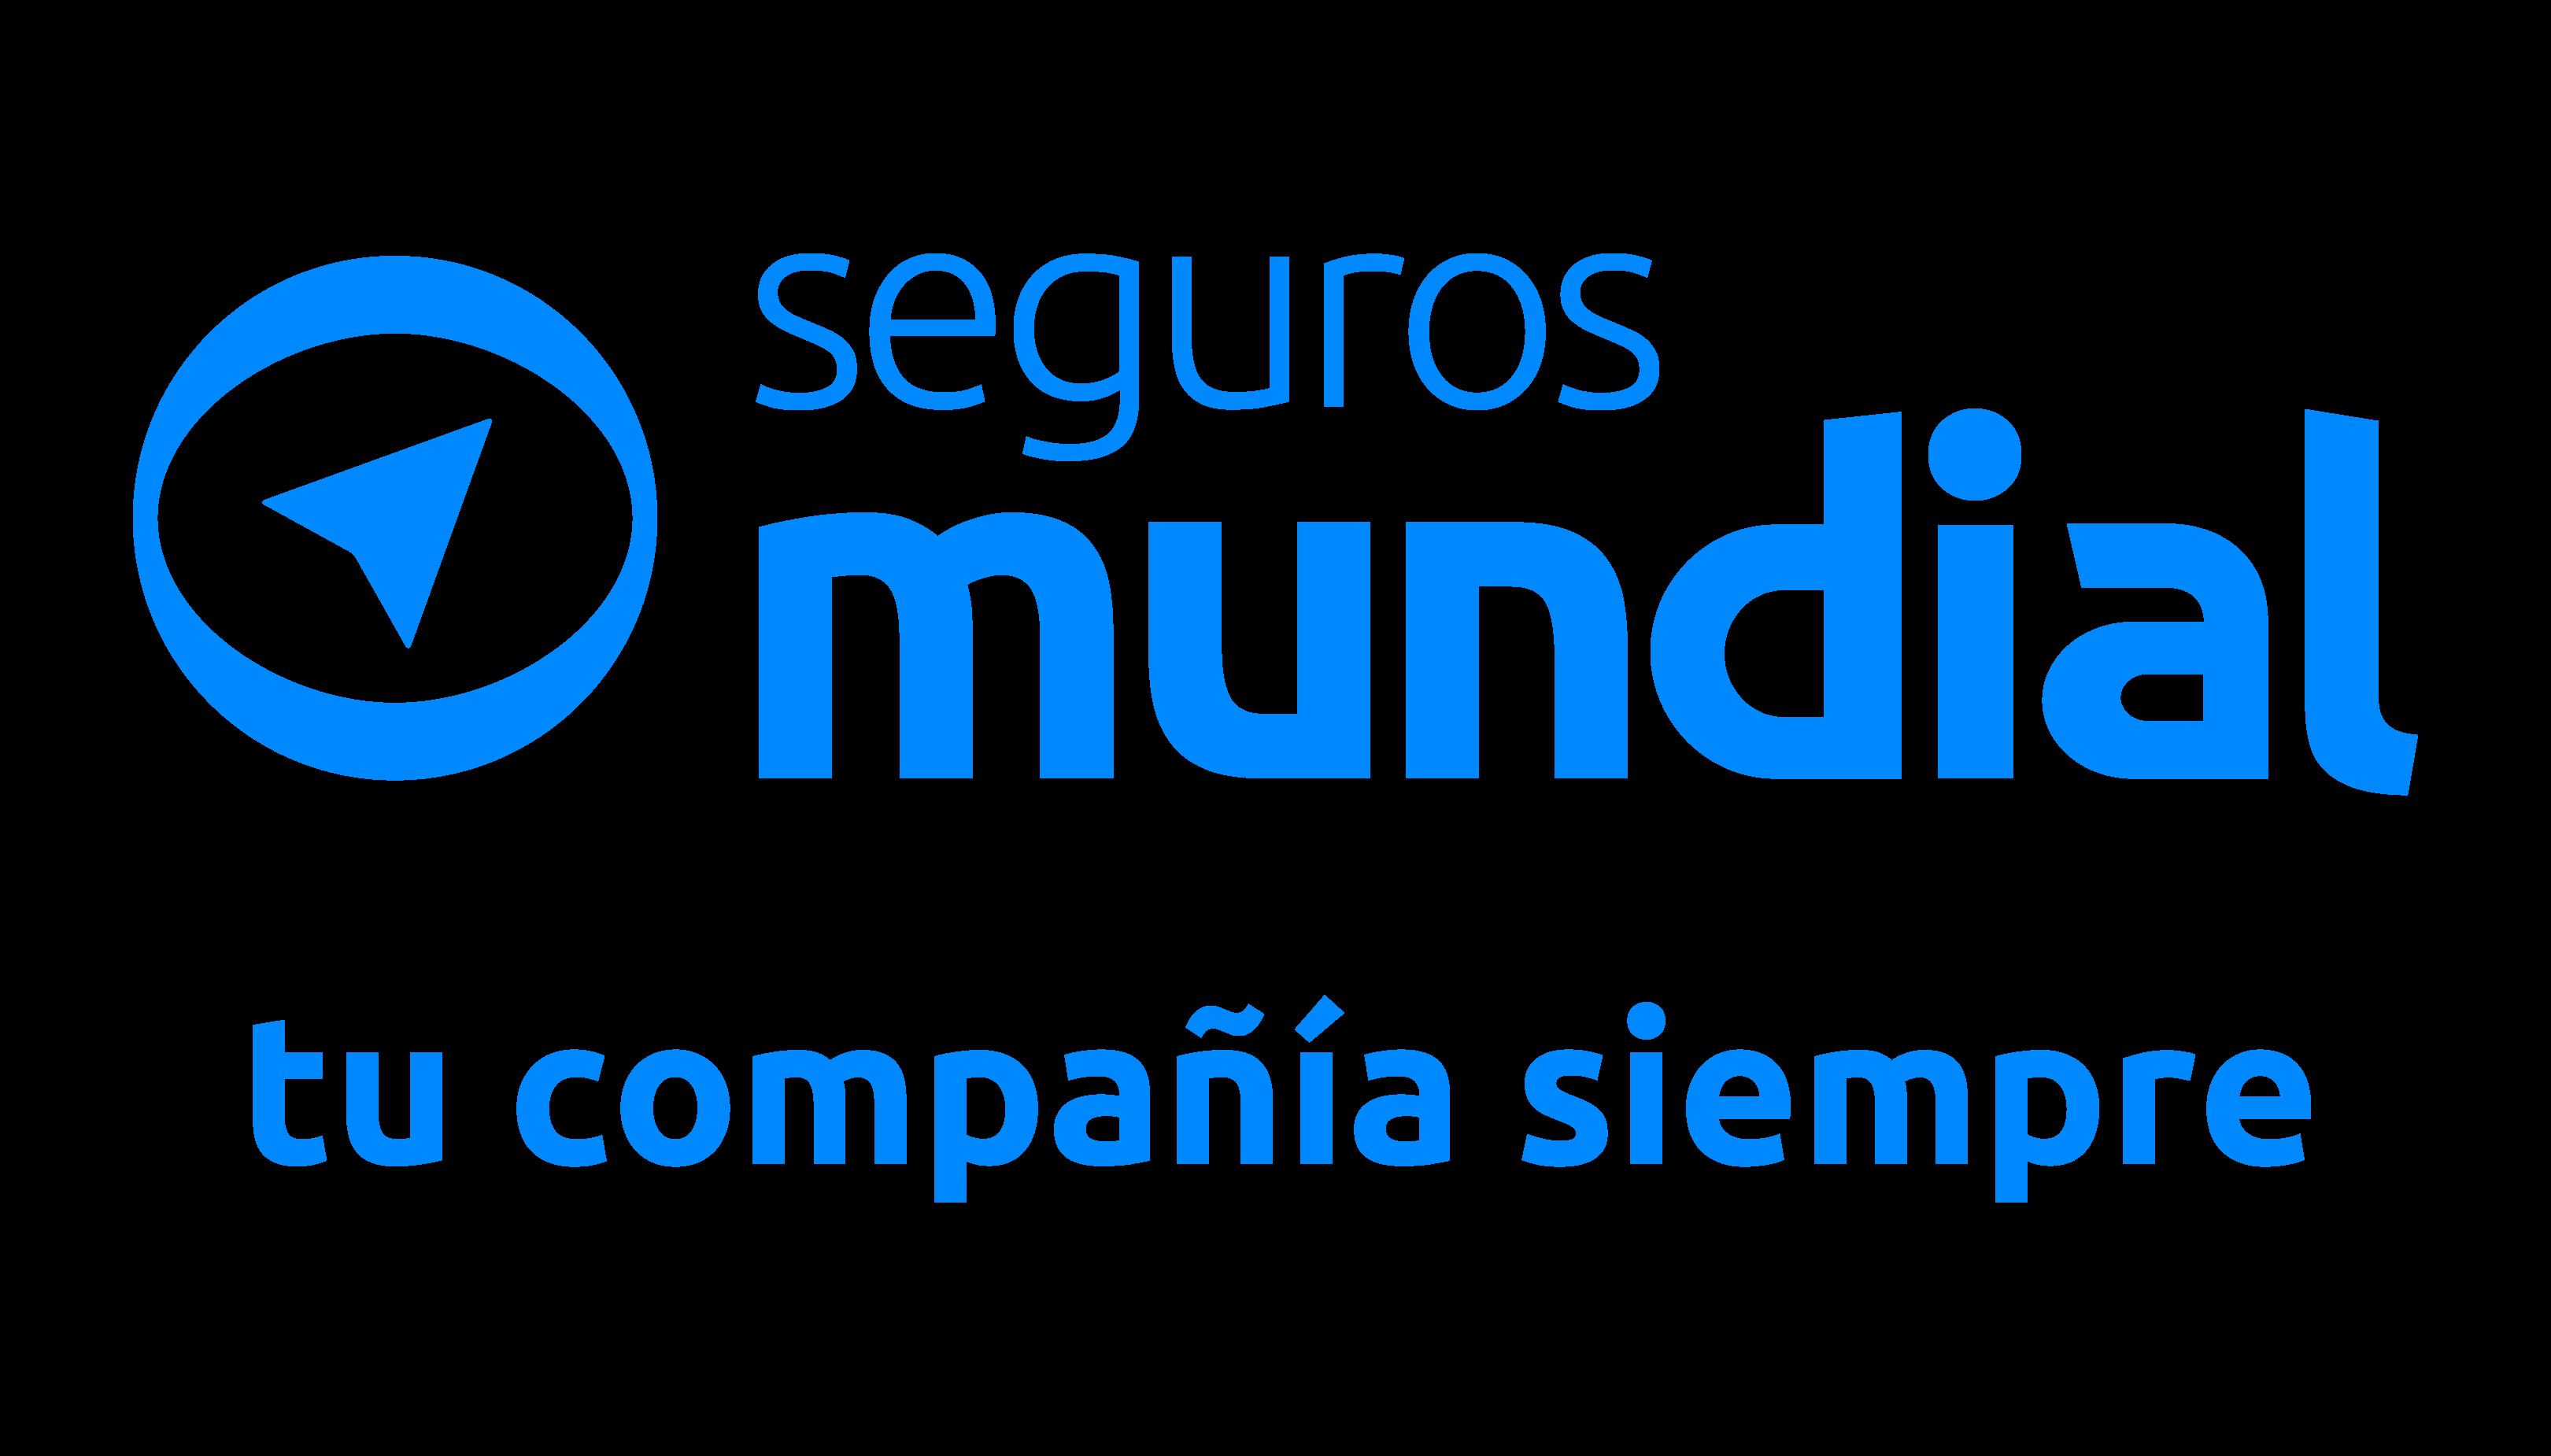 Archivo:Logo mundial seguros.png - Wikipedia, la enciclopedia libre